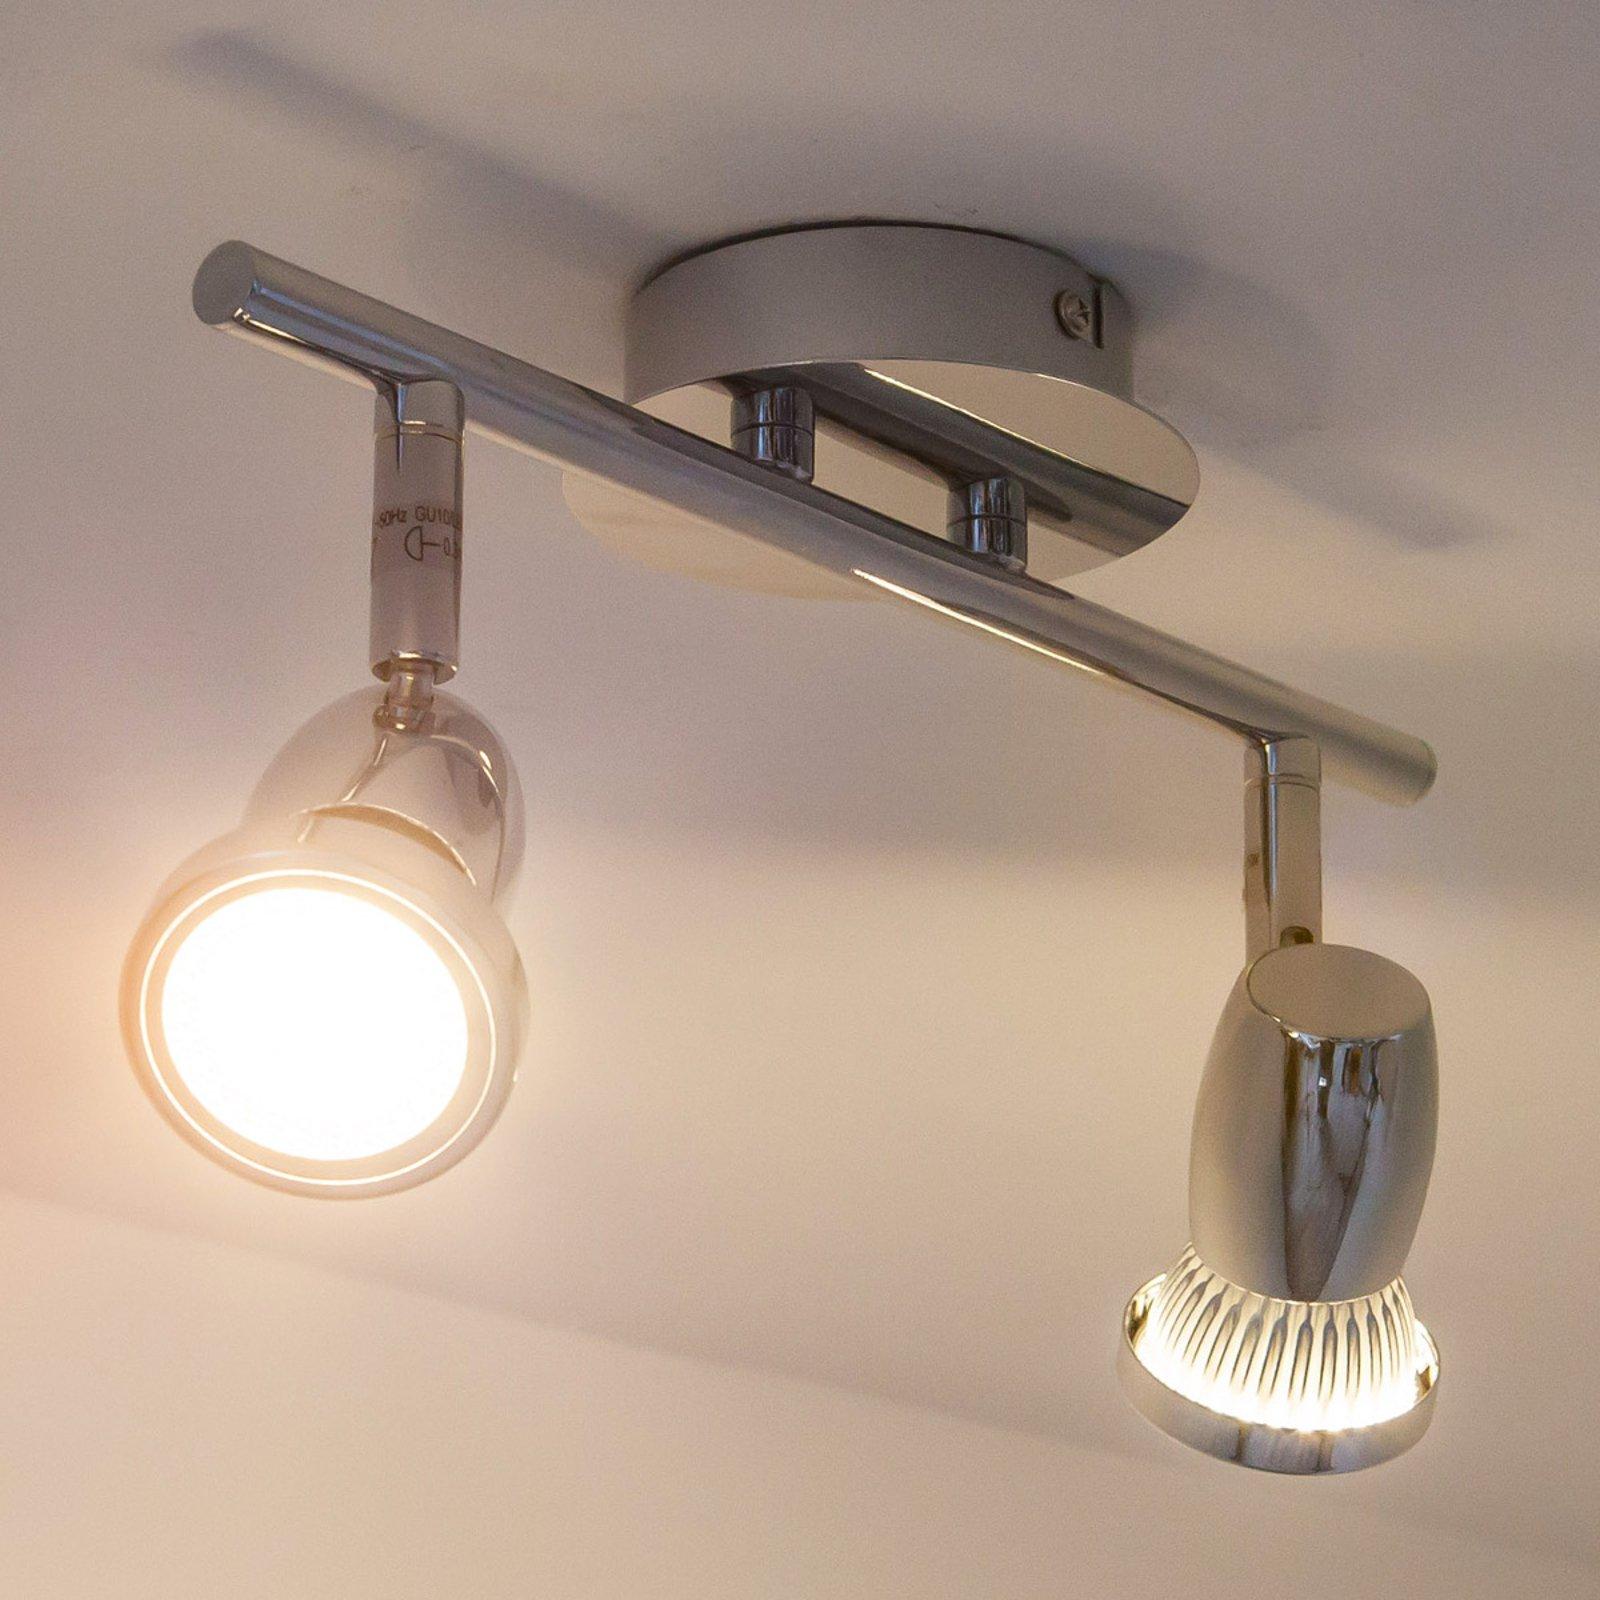 LED-takspot Arminius, 2-punkts